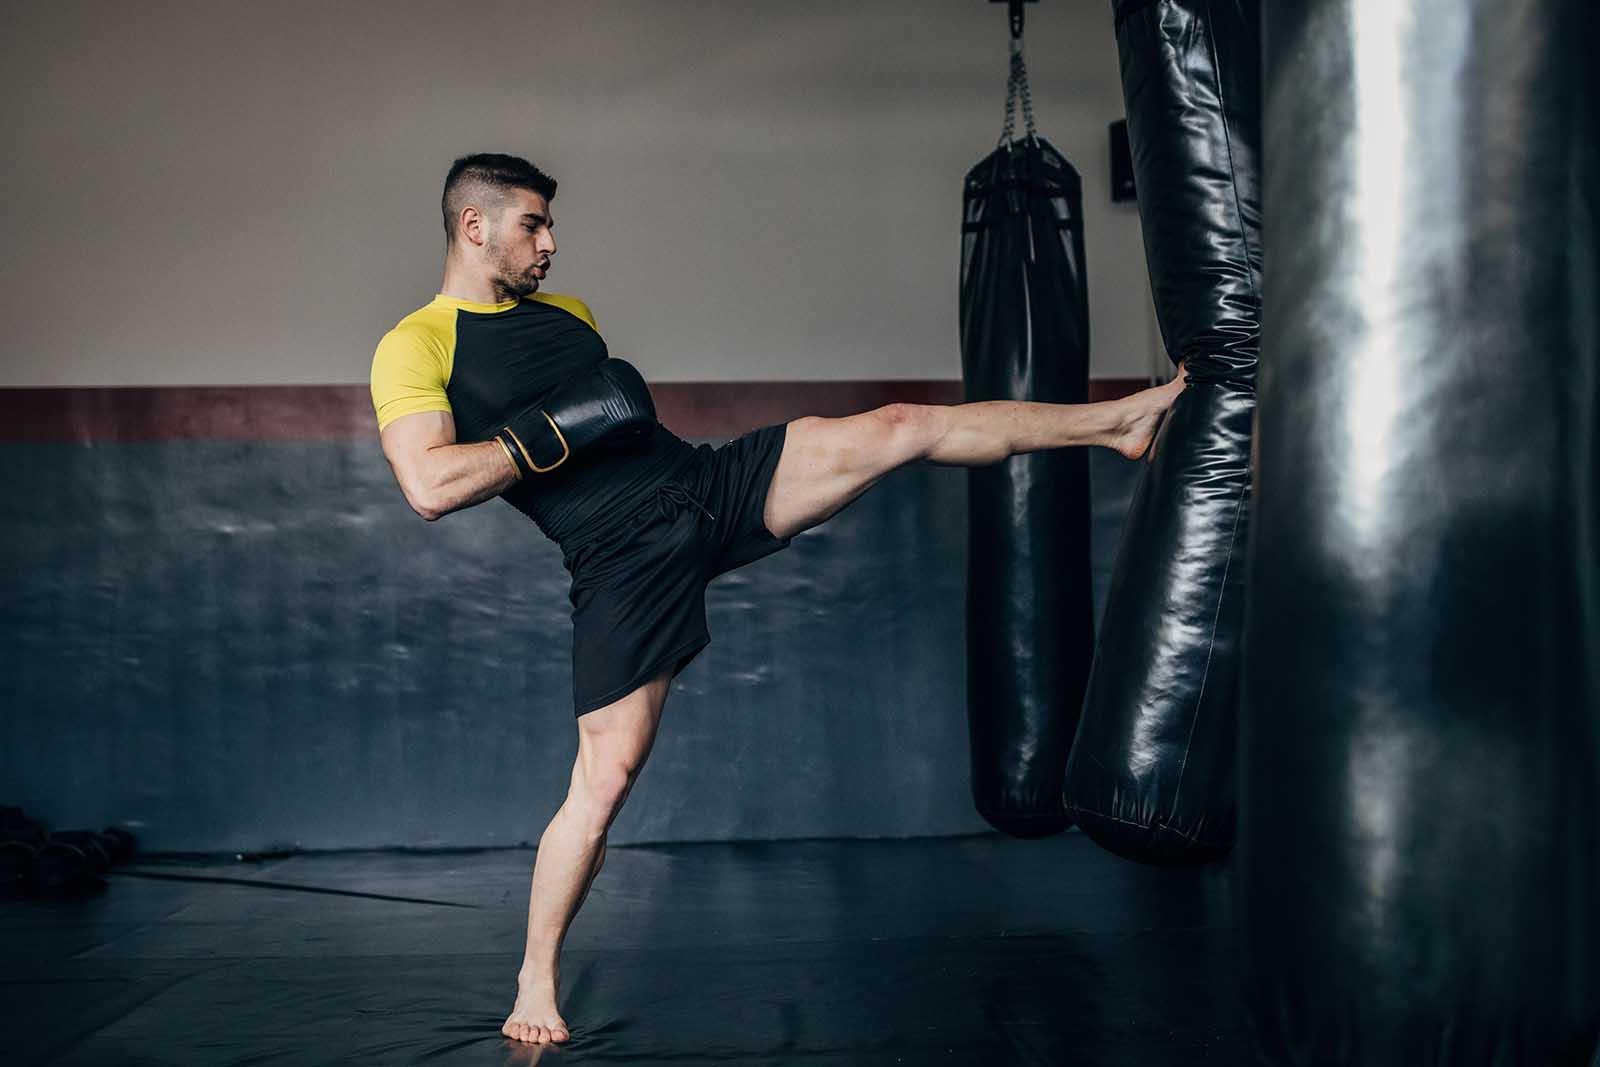 Man Kicking heavy bag